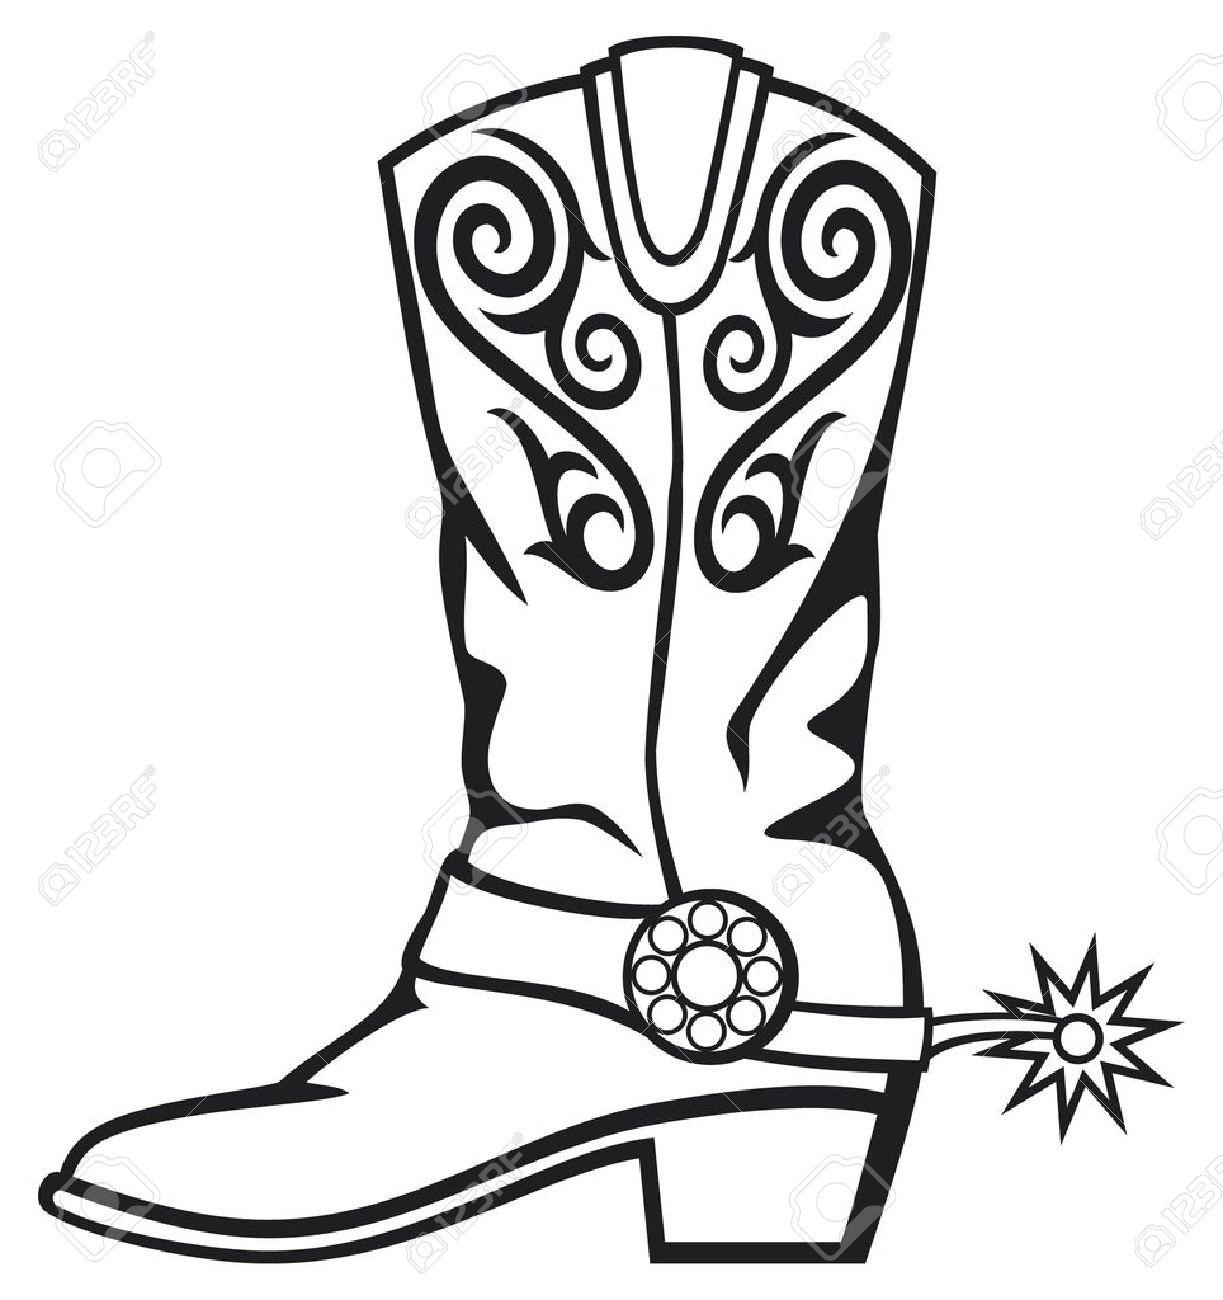 968 Cowboy Boots free clipart.